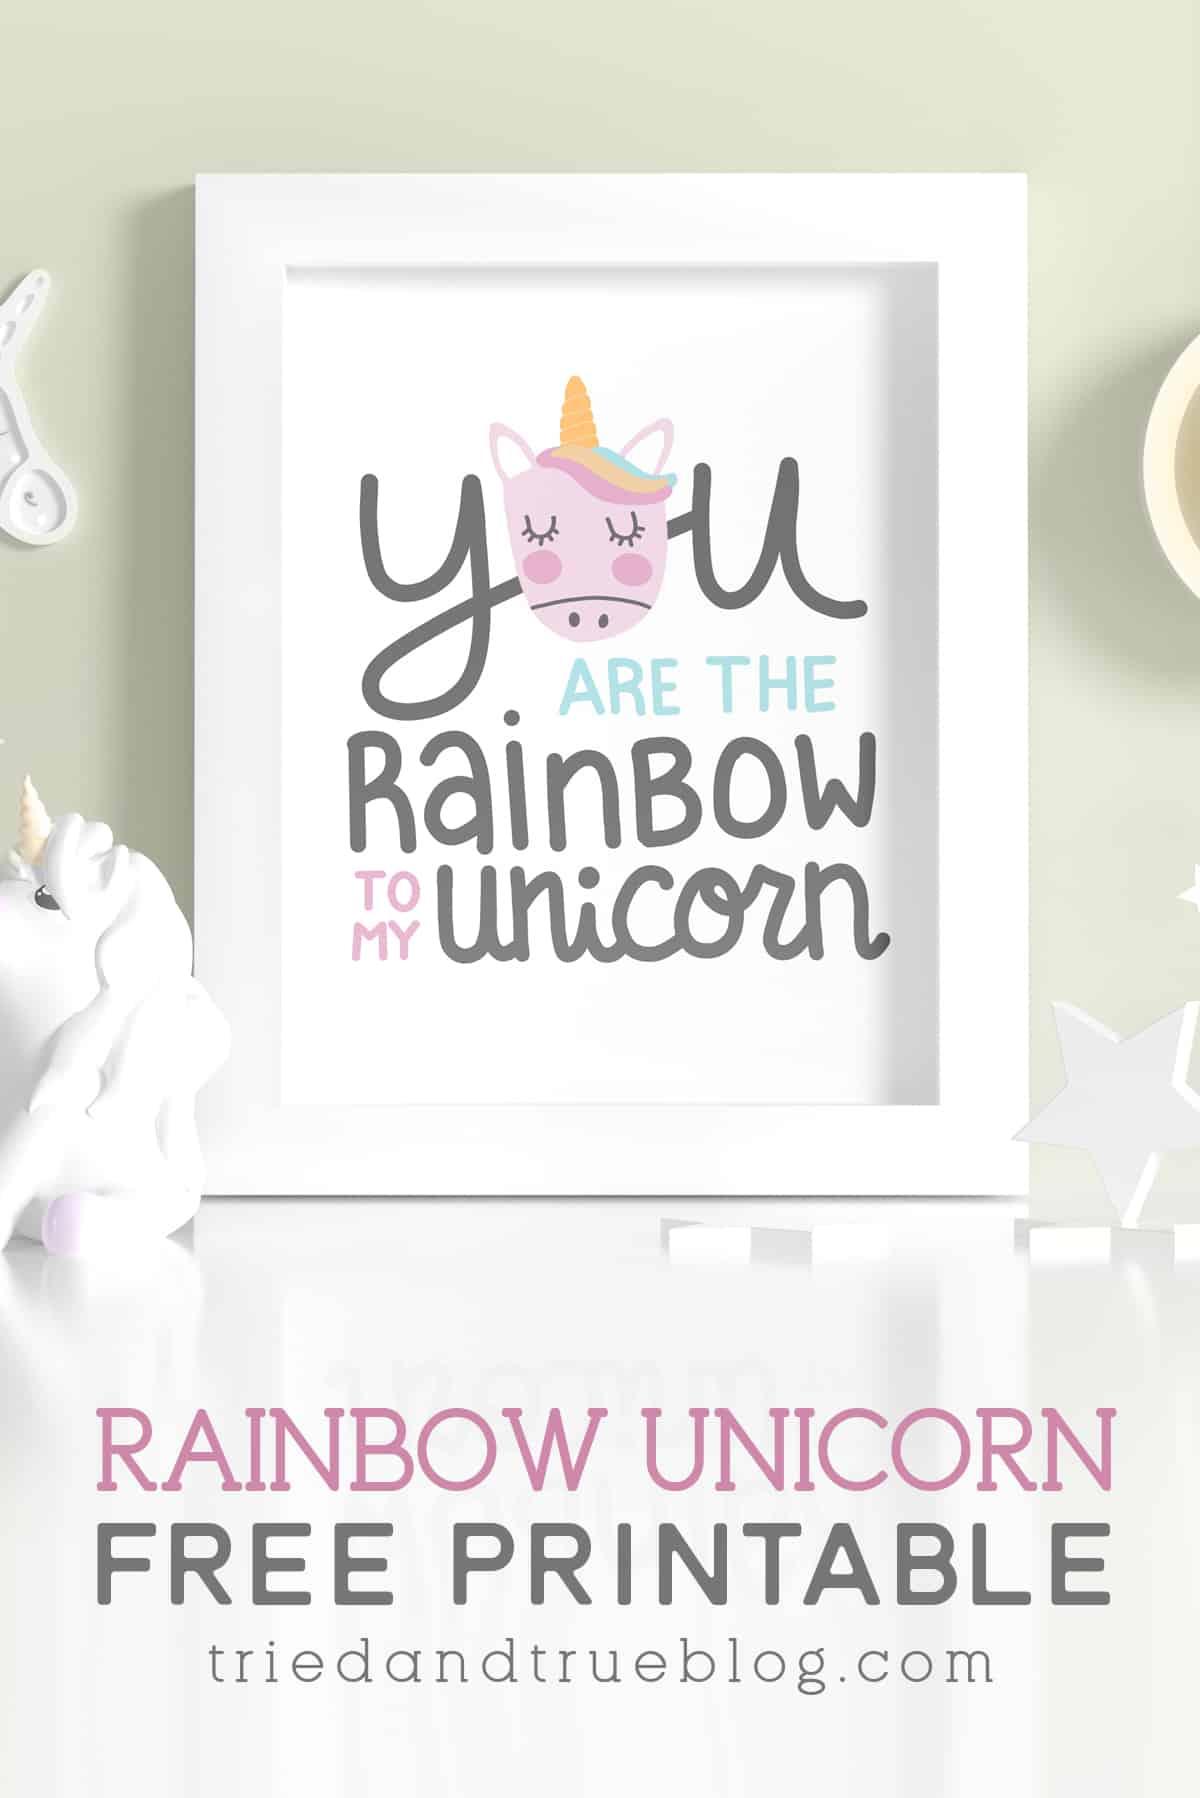 Framed Rainbow to My Unicorn free printable art.